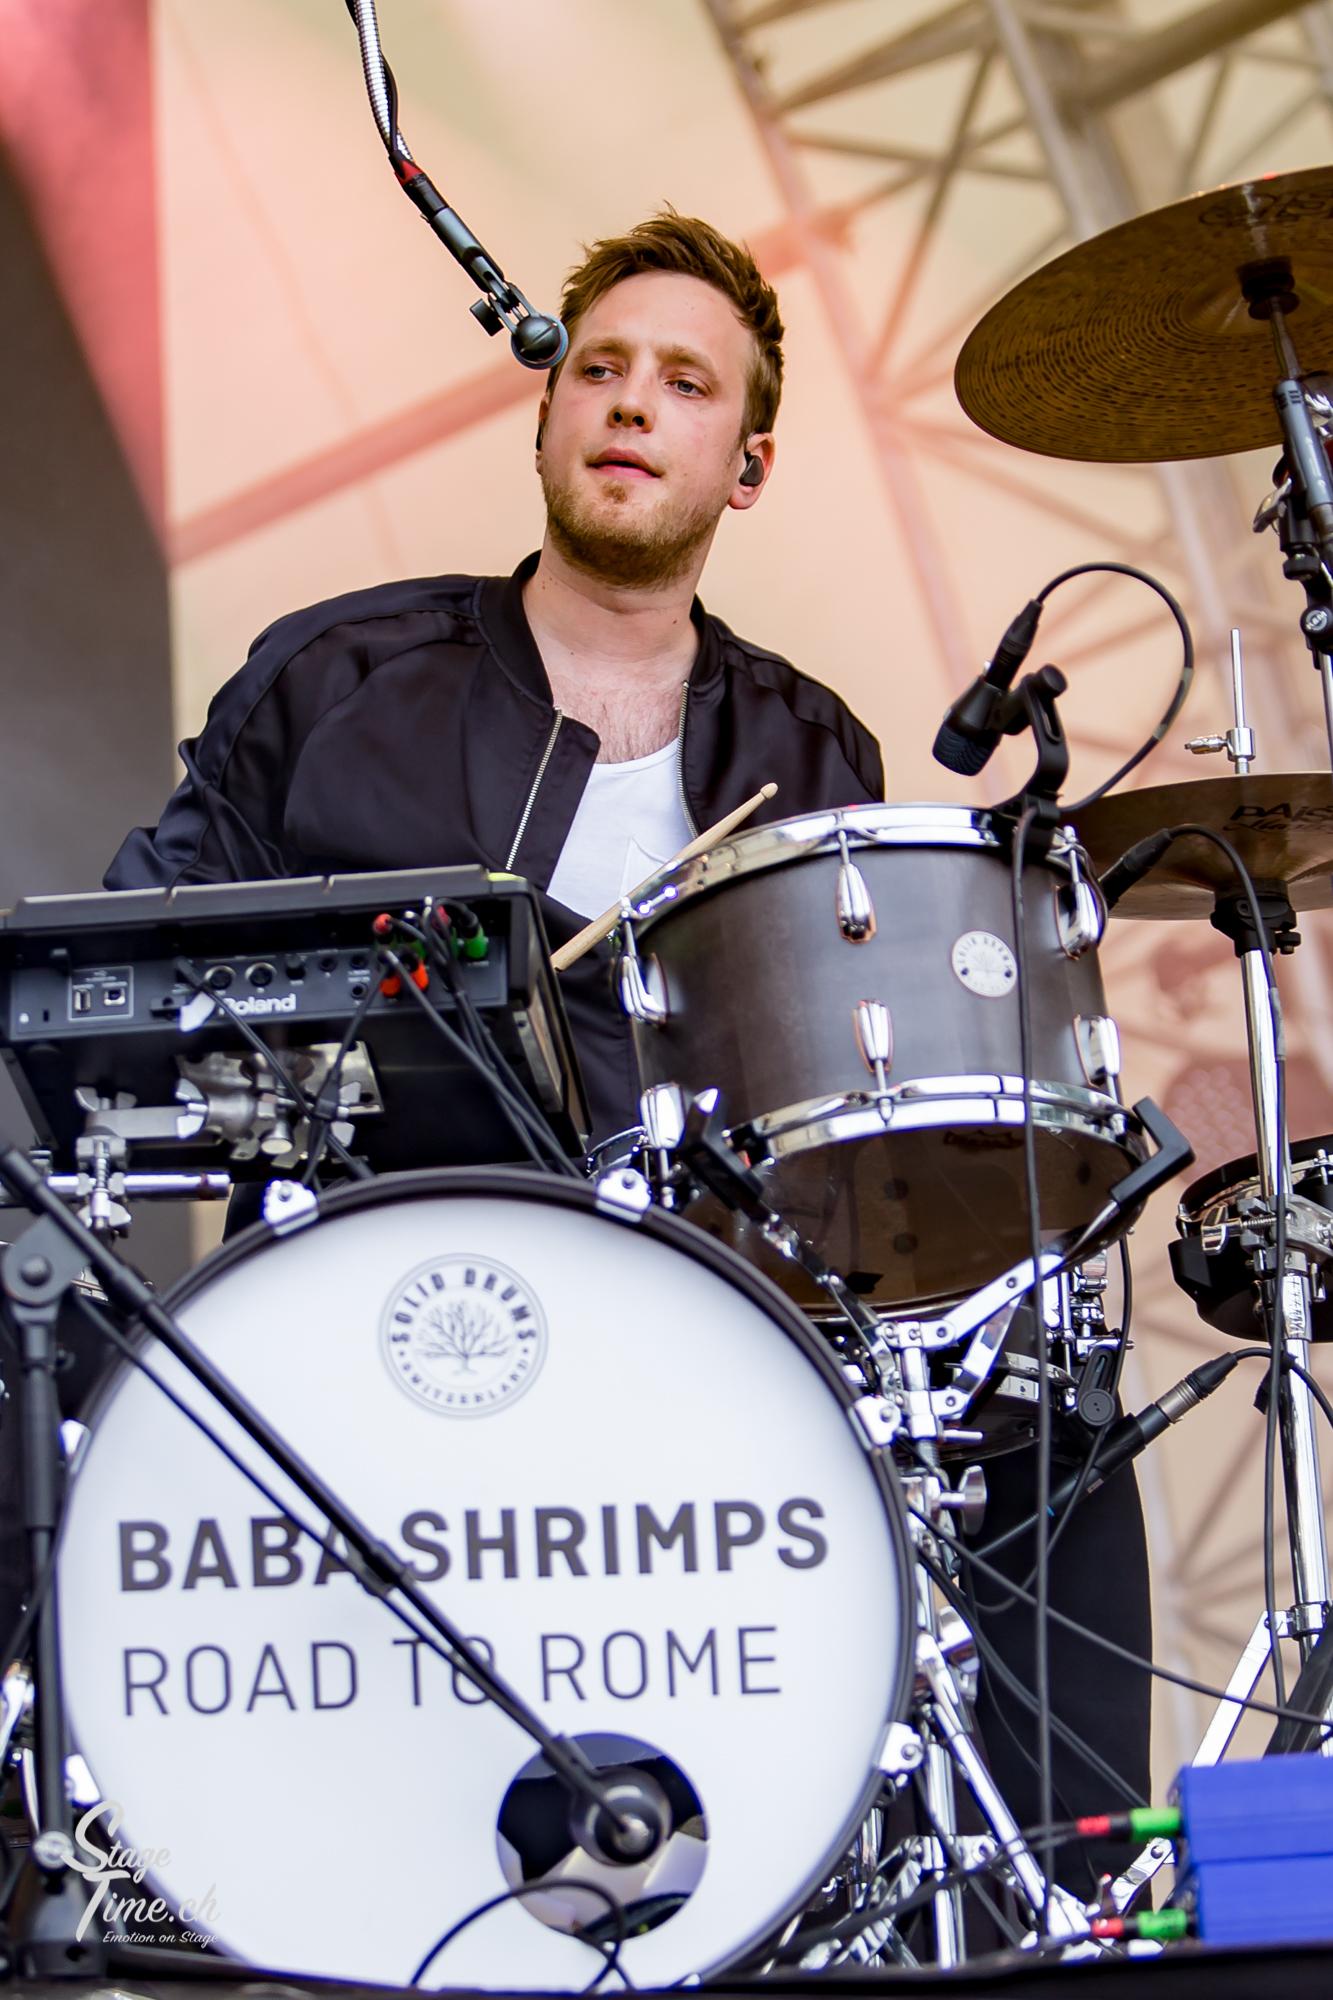 Baba_Shrimps